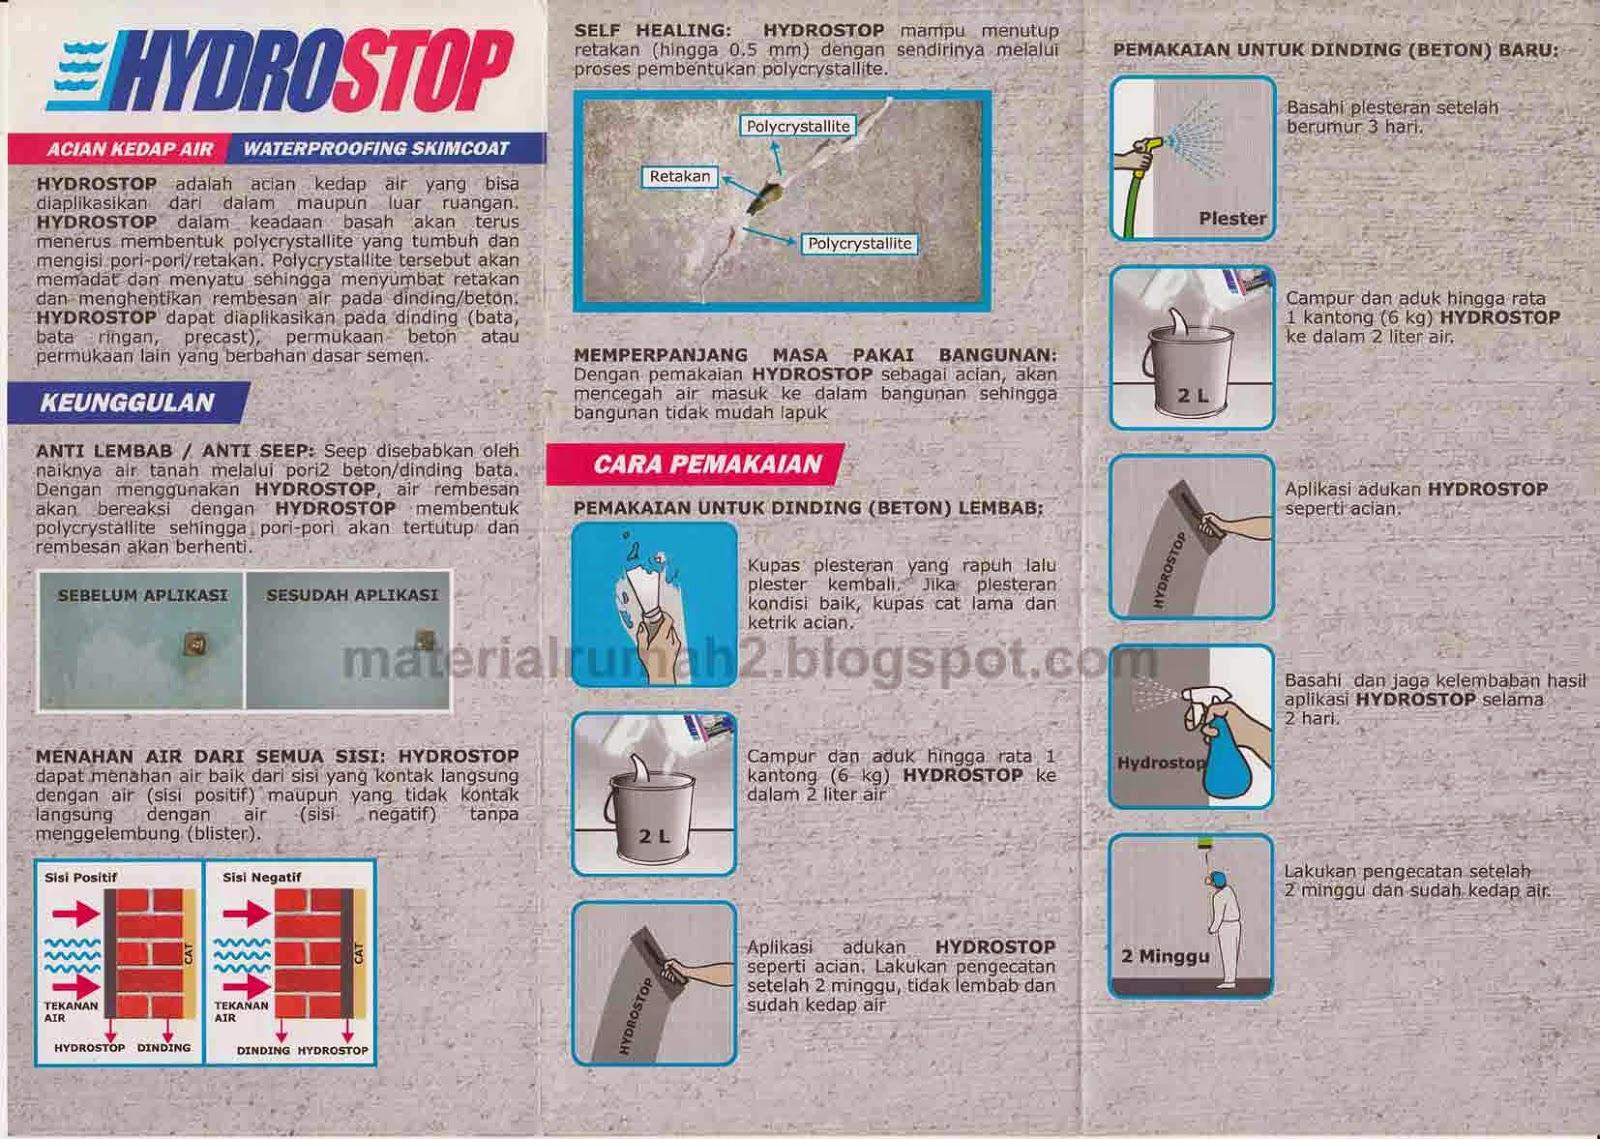 Waterproofing Skimcoat HYDROSTOP